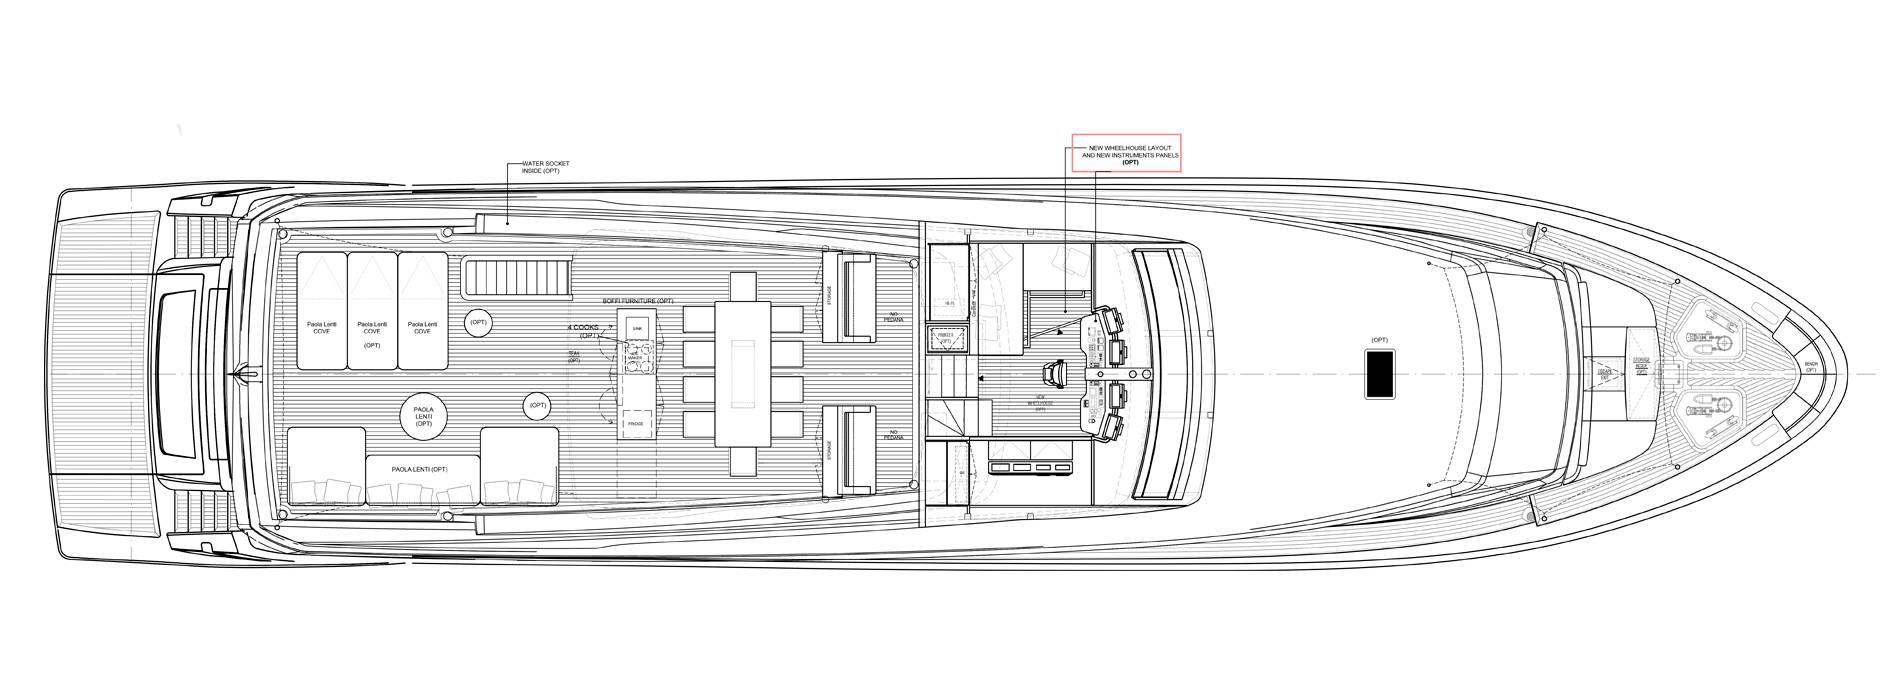 Sanlorenzo Yachts SL106-625 Flying bridge